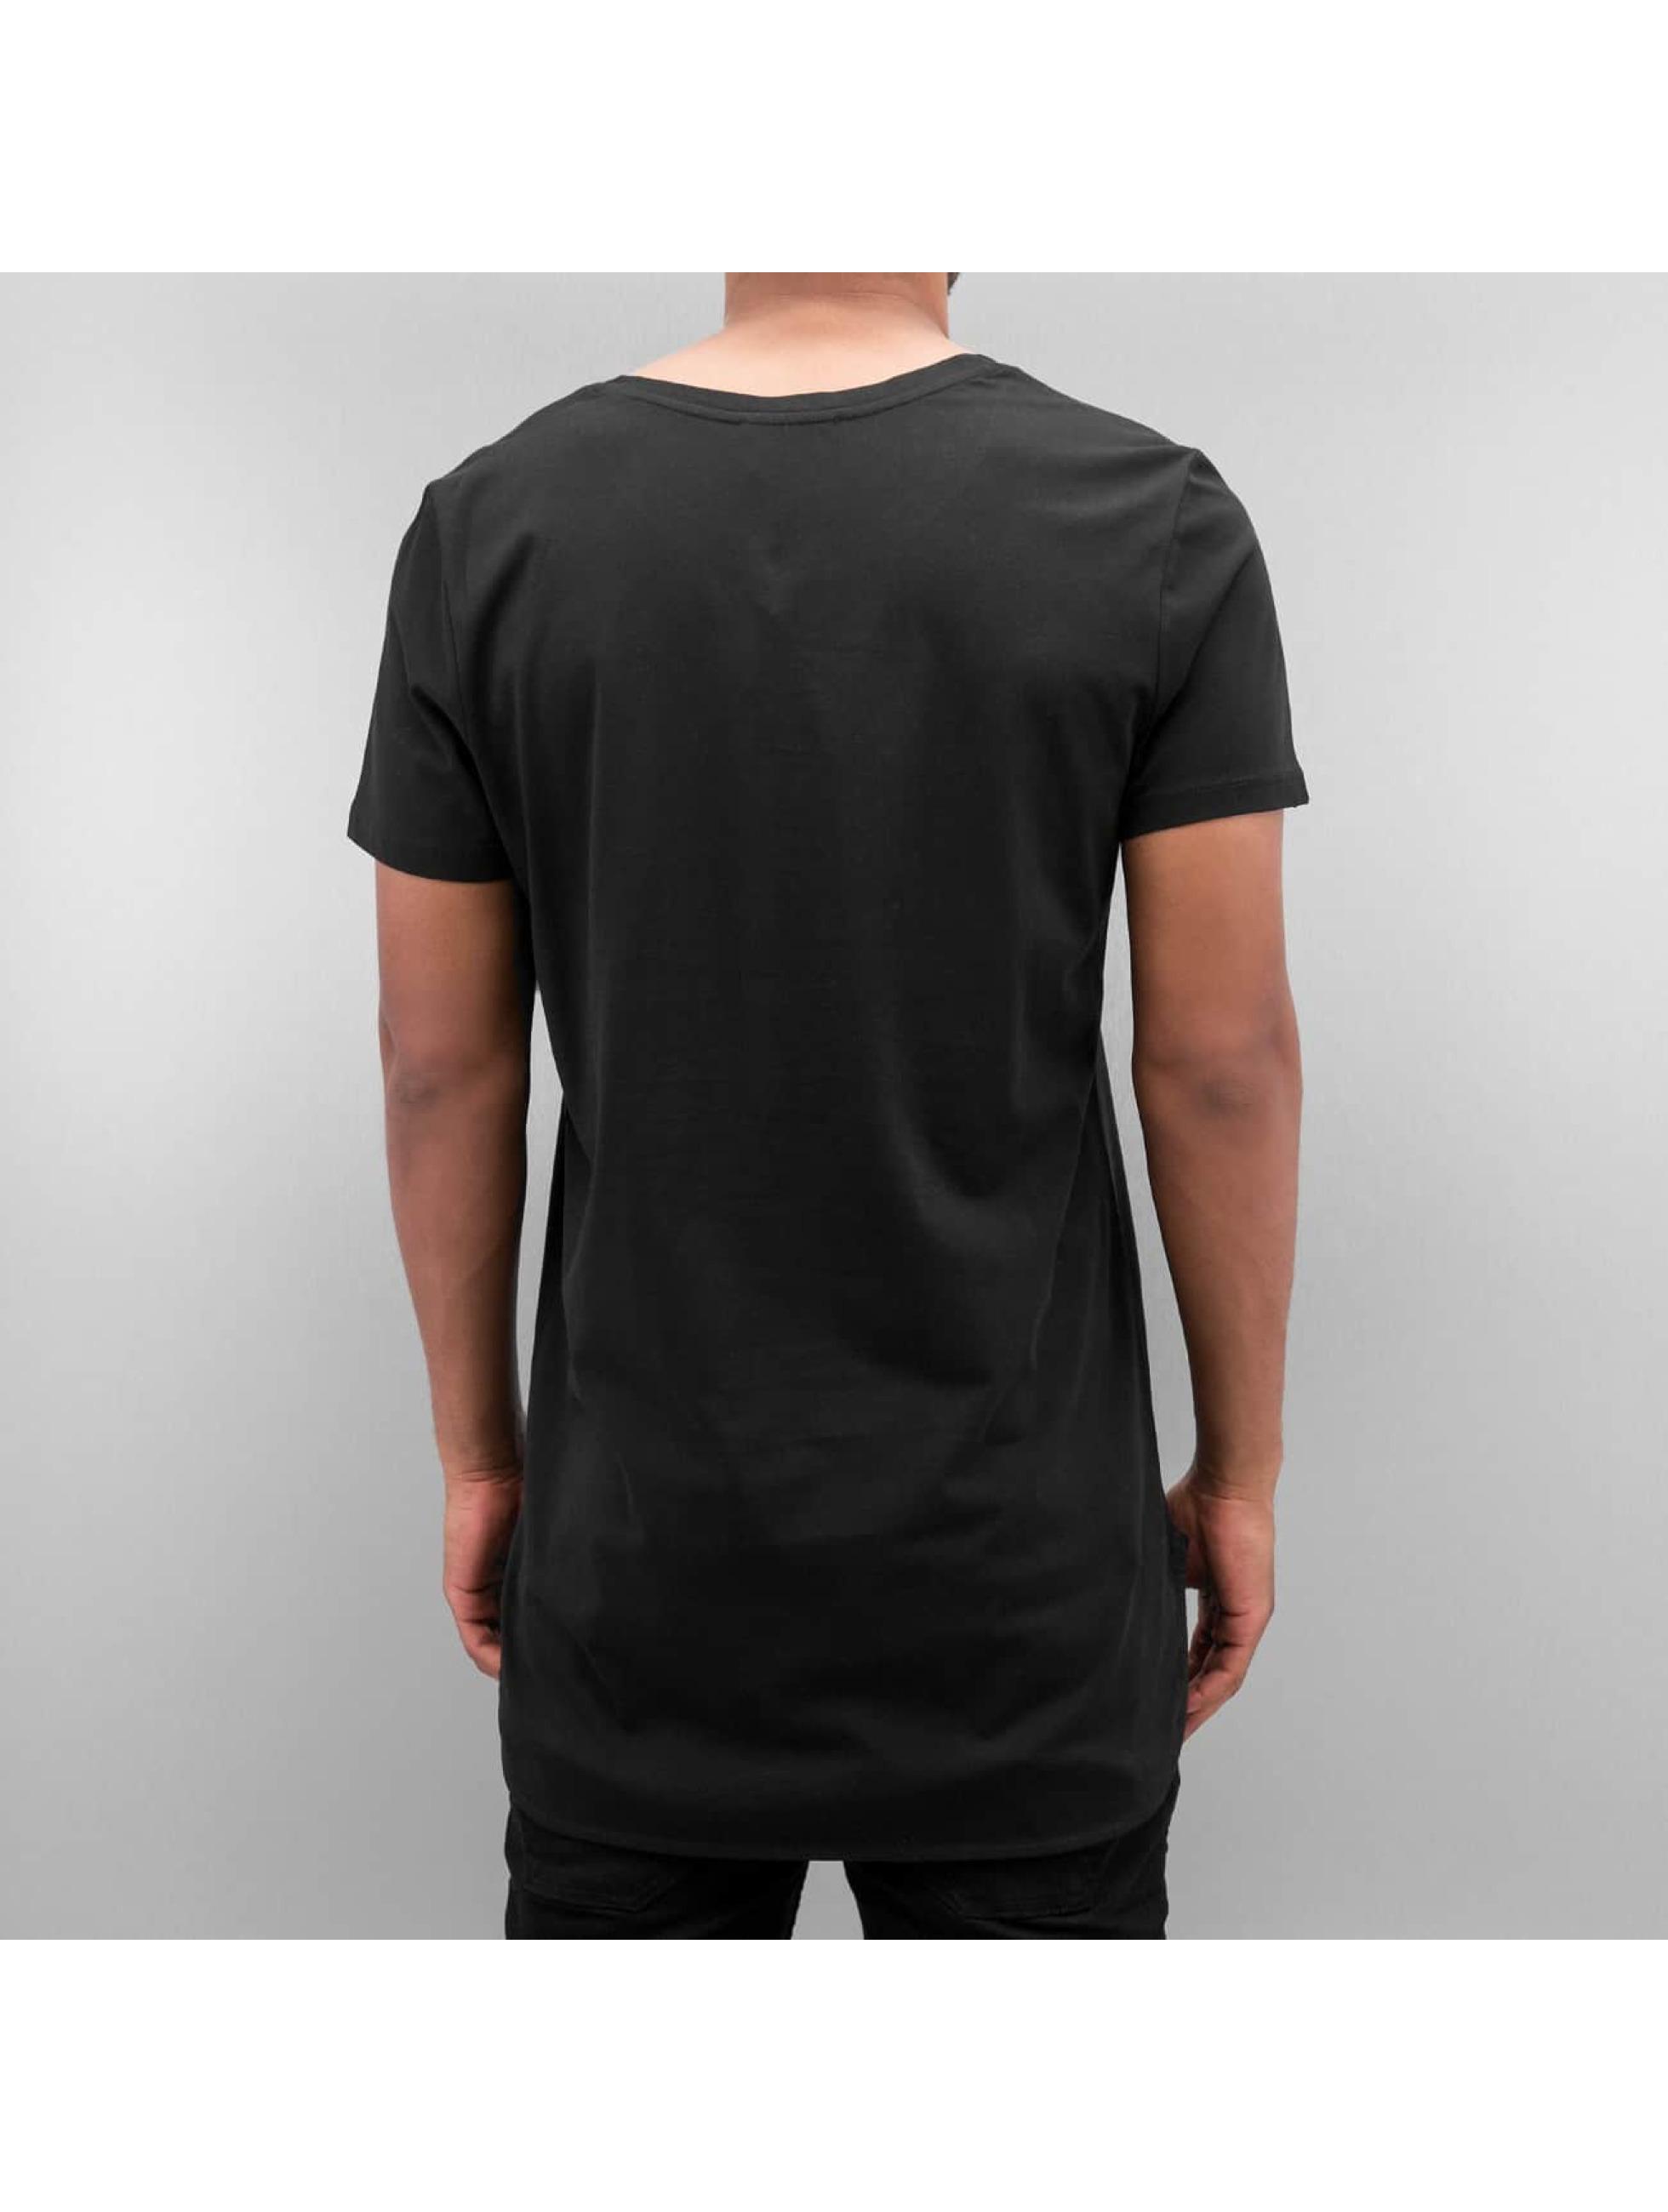 VSCT Clubwear Tall Tees Monochrome черный